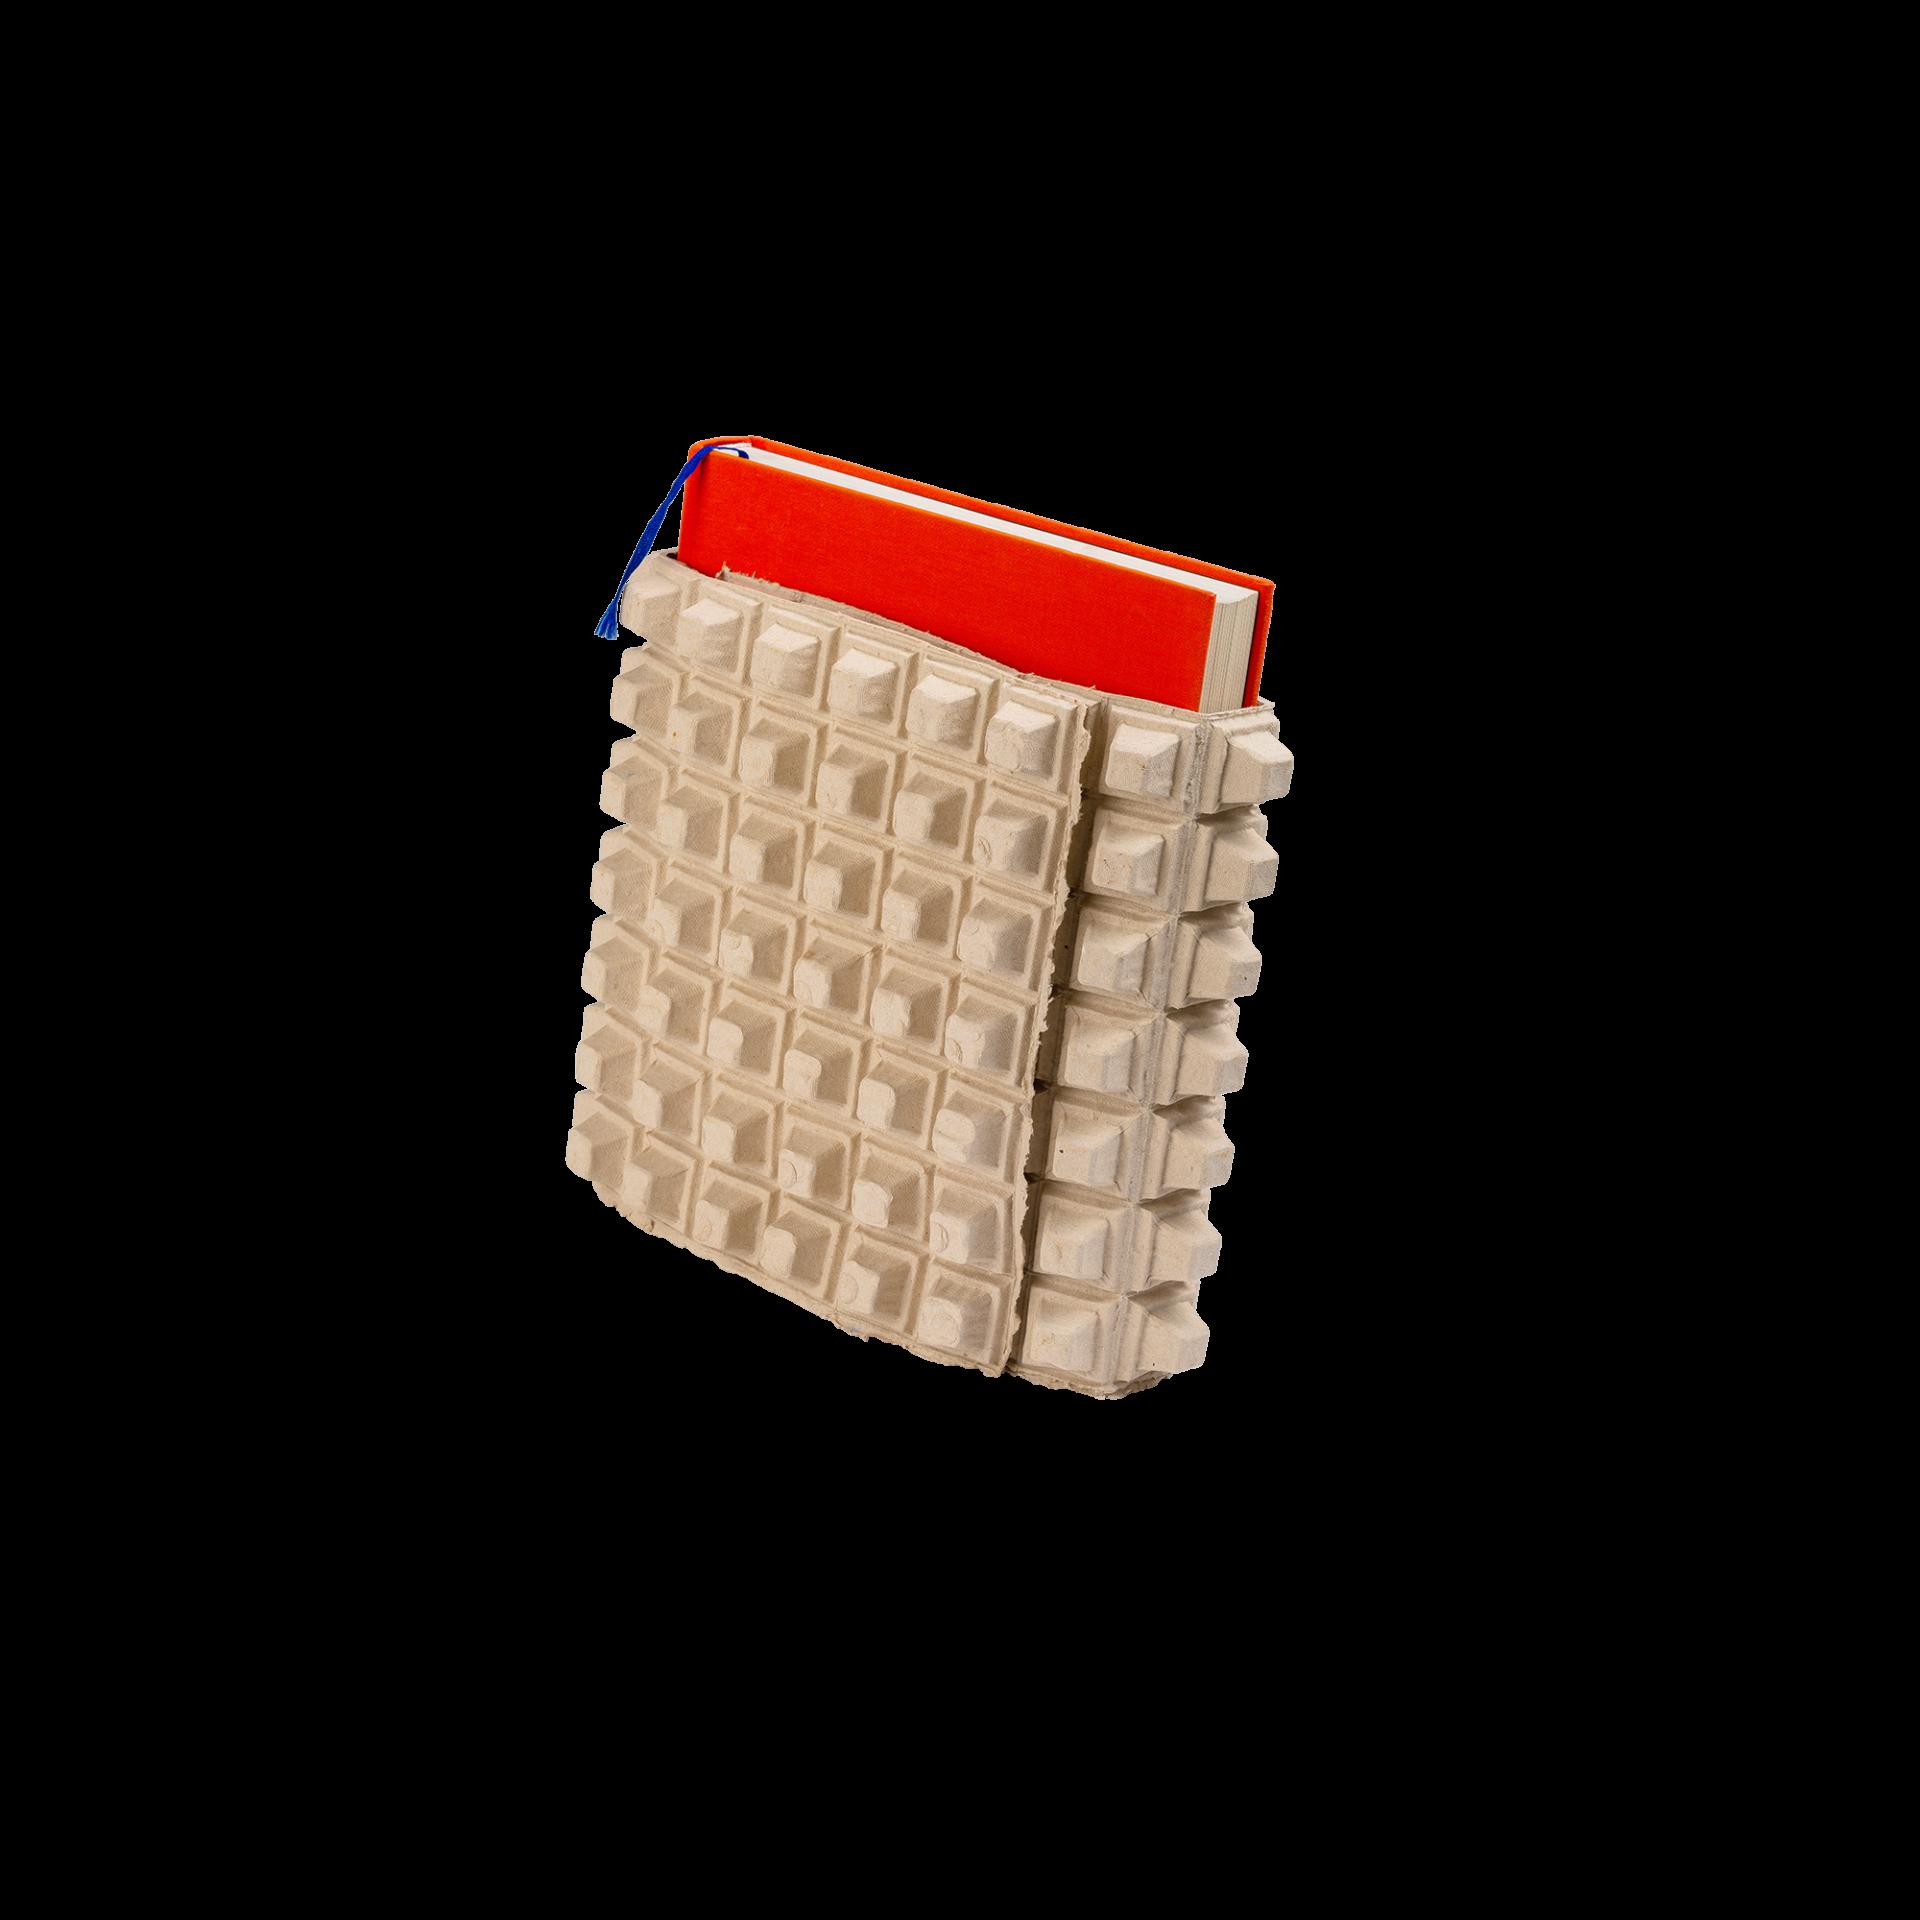 Pulp-Tec Noppenmappe Verpackung